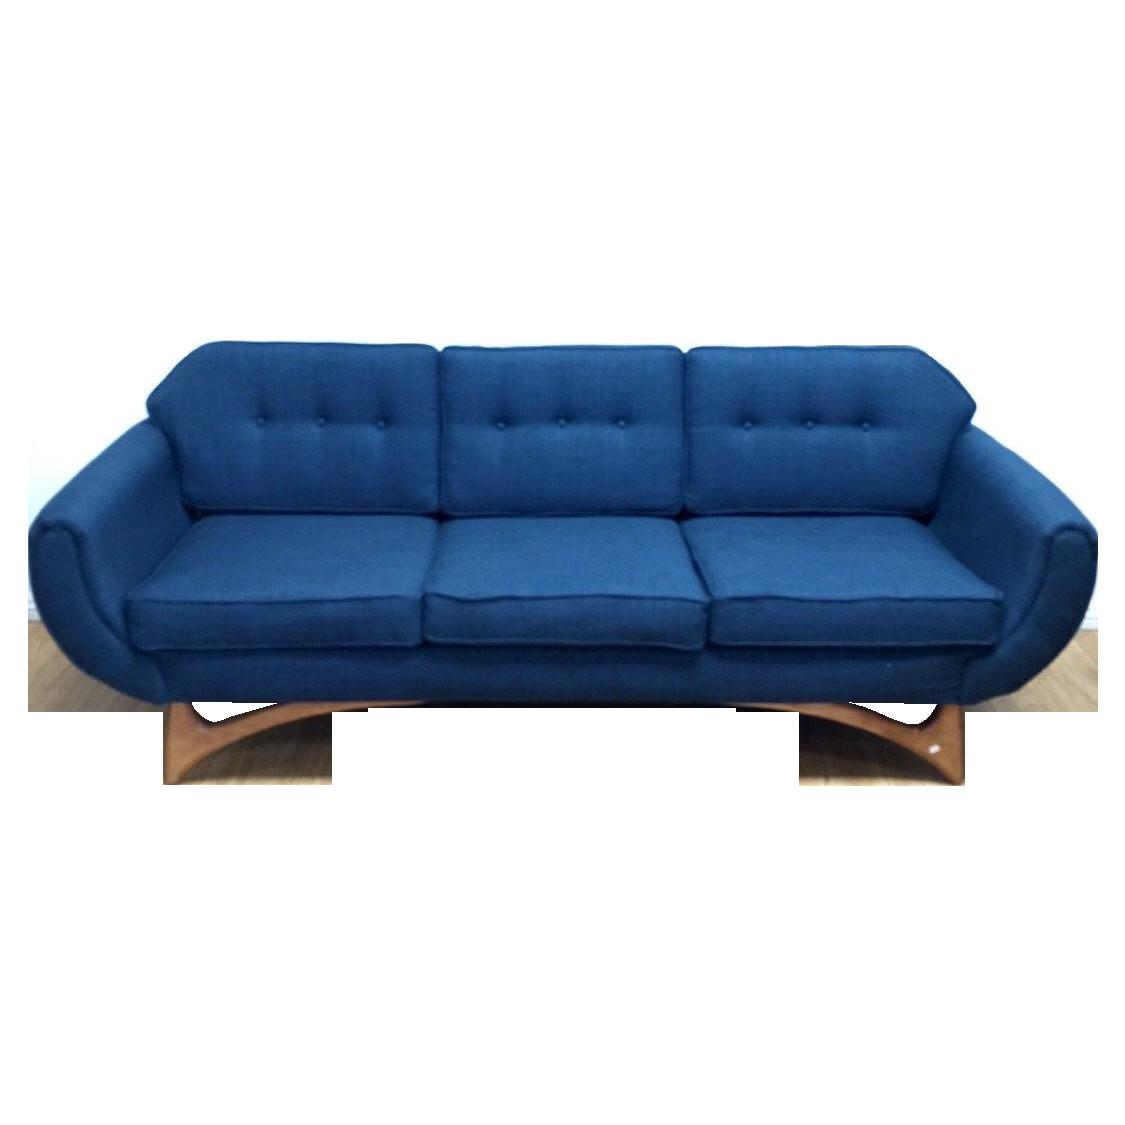 custom mid century style sofa chairish. Black Bedroom Furniture Sets. Home Design Ideas